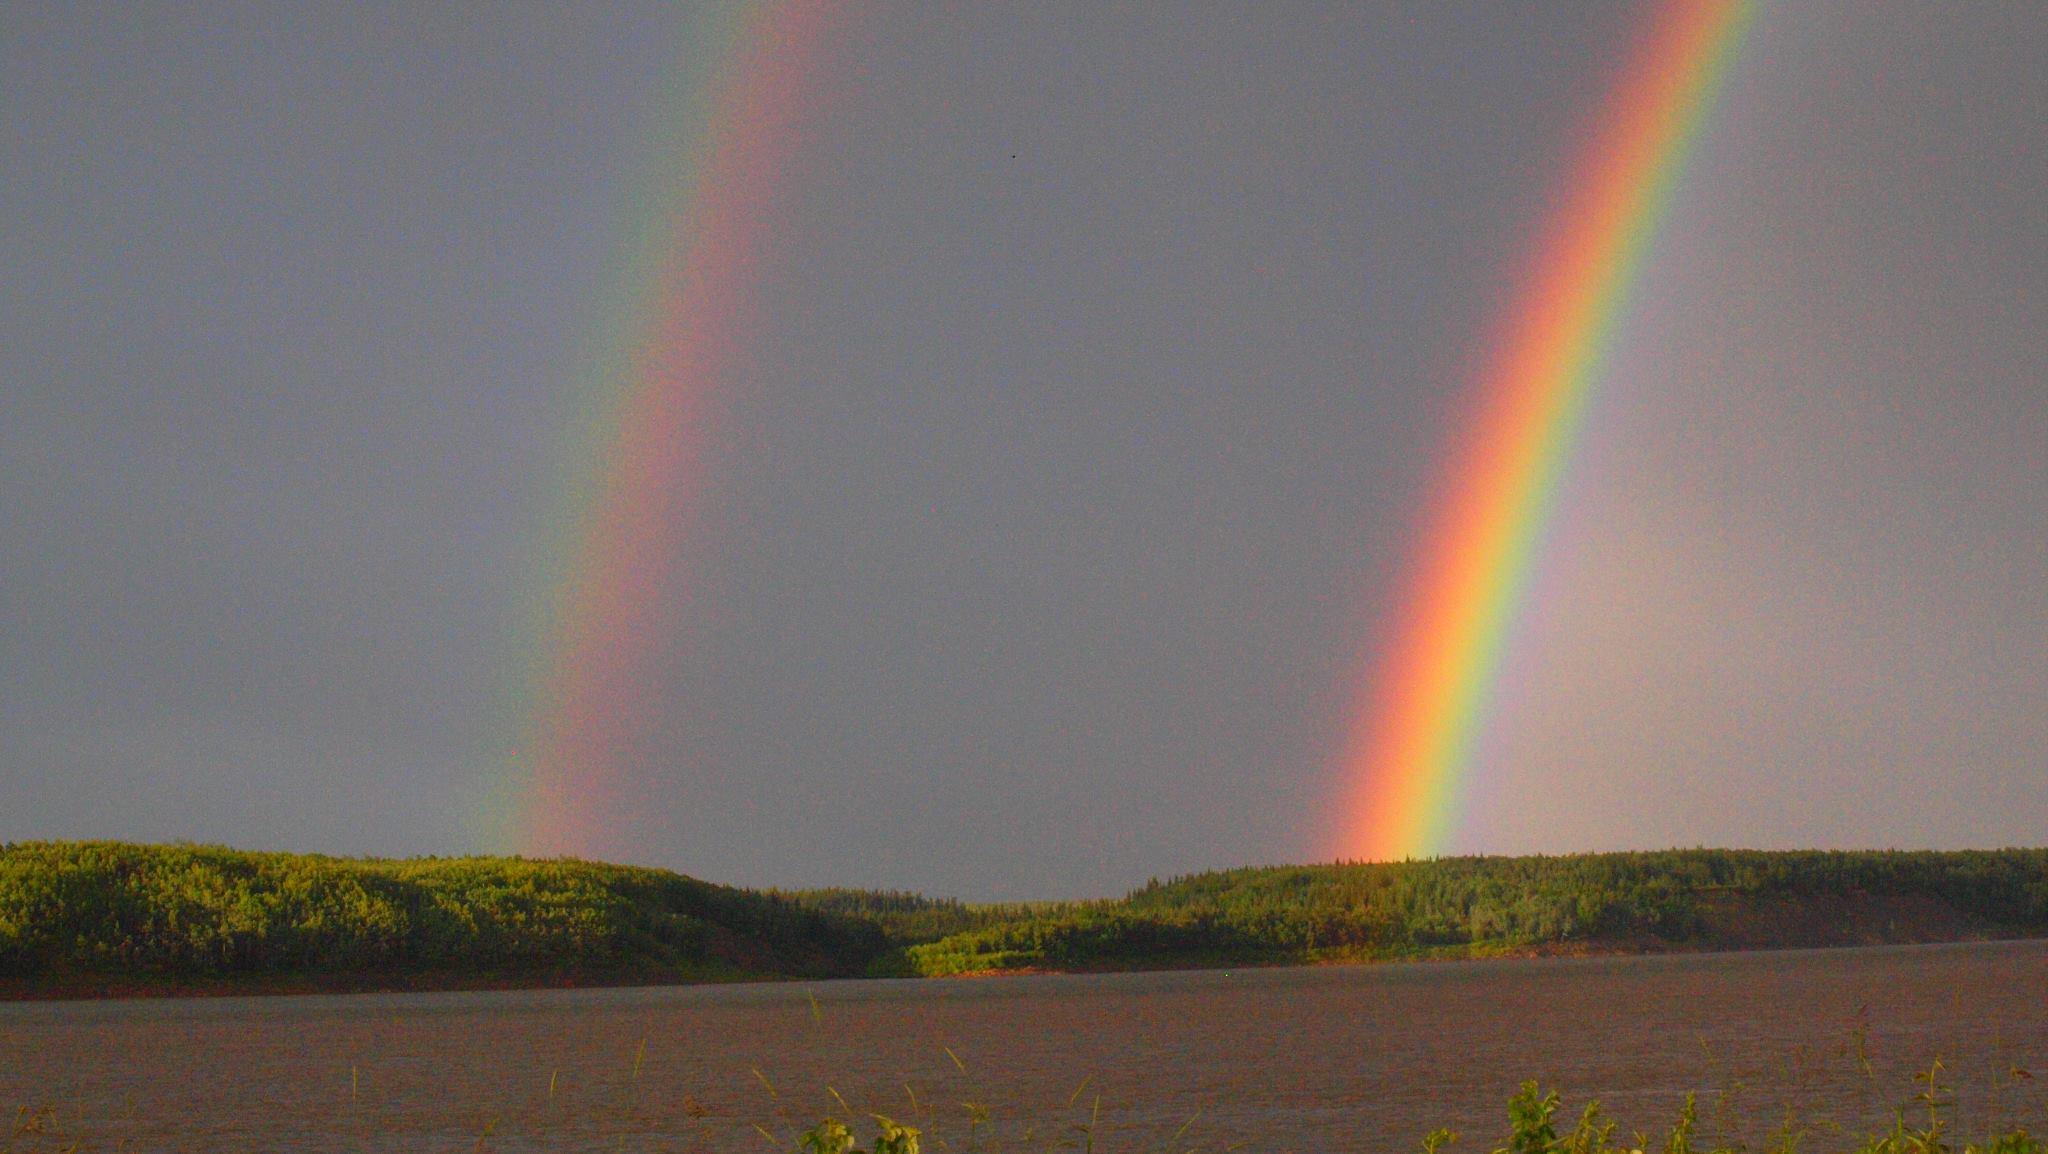 Rainbows around the world | Earth | EarthSky Rainbowsol